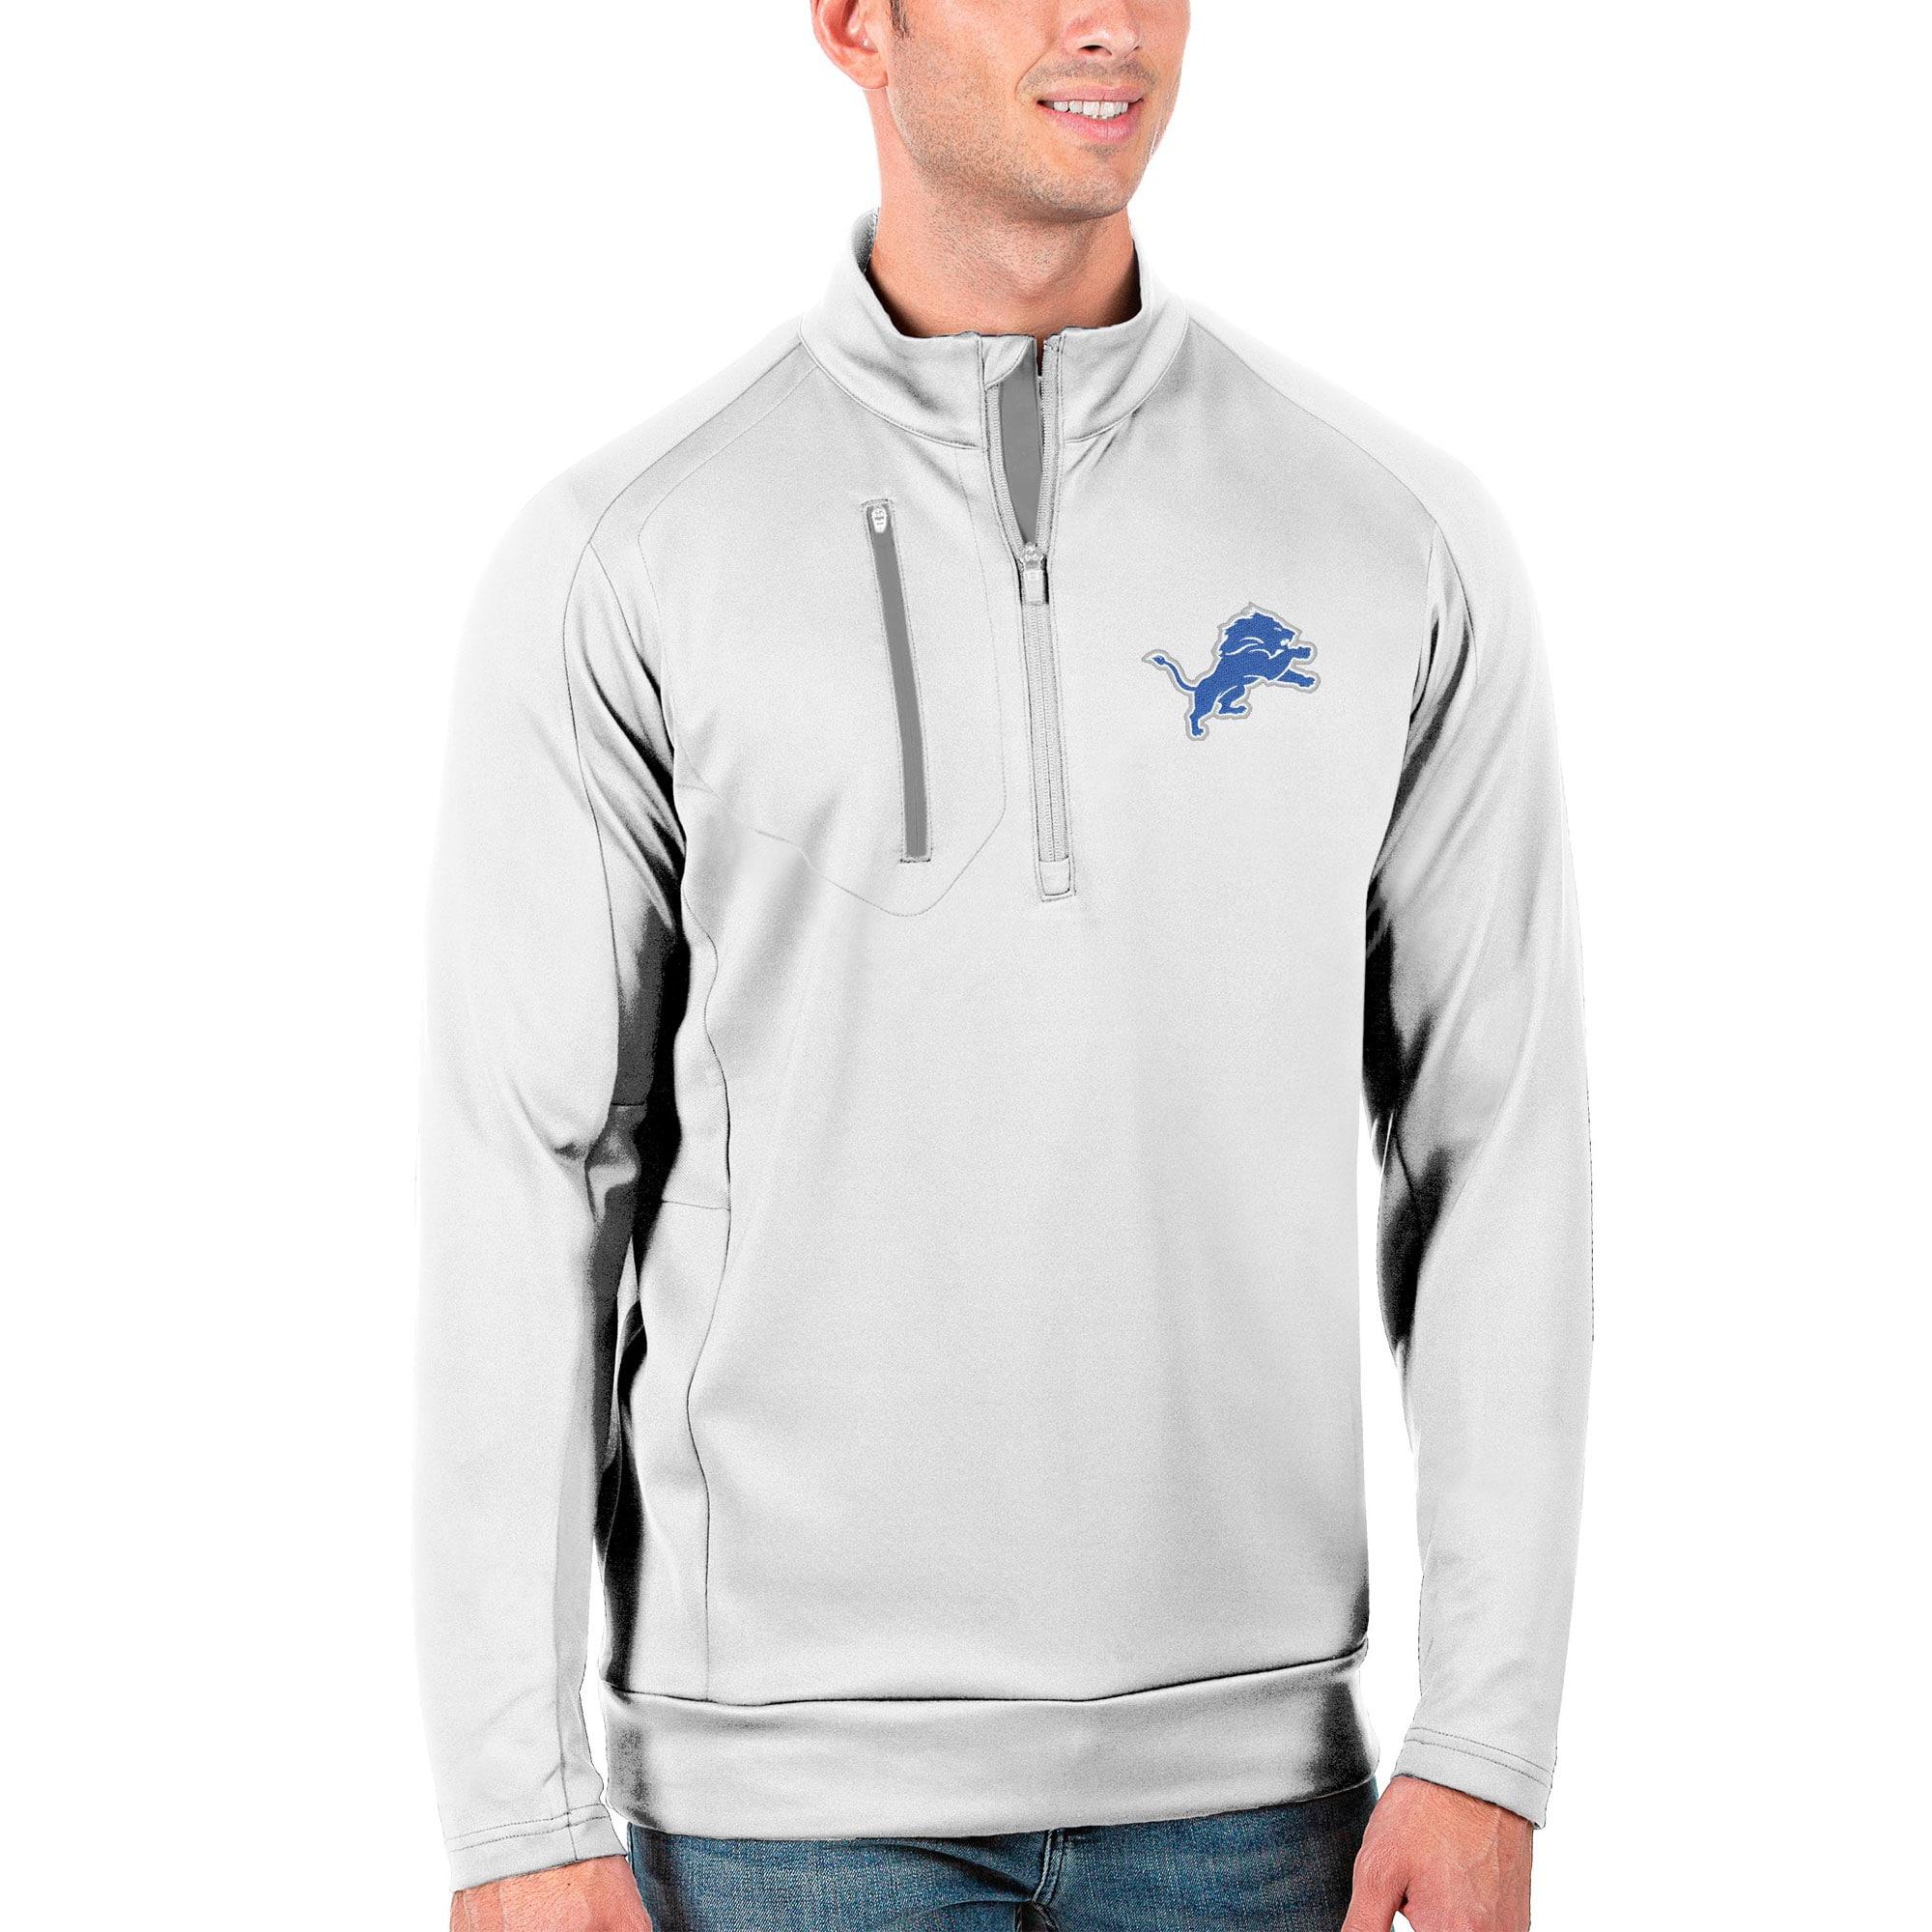 Detroit Lions Antigua Generation Quarter-Zip Pullover Jacket - White/Silver